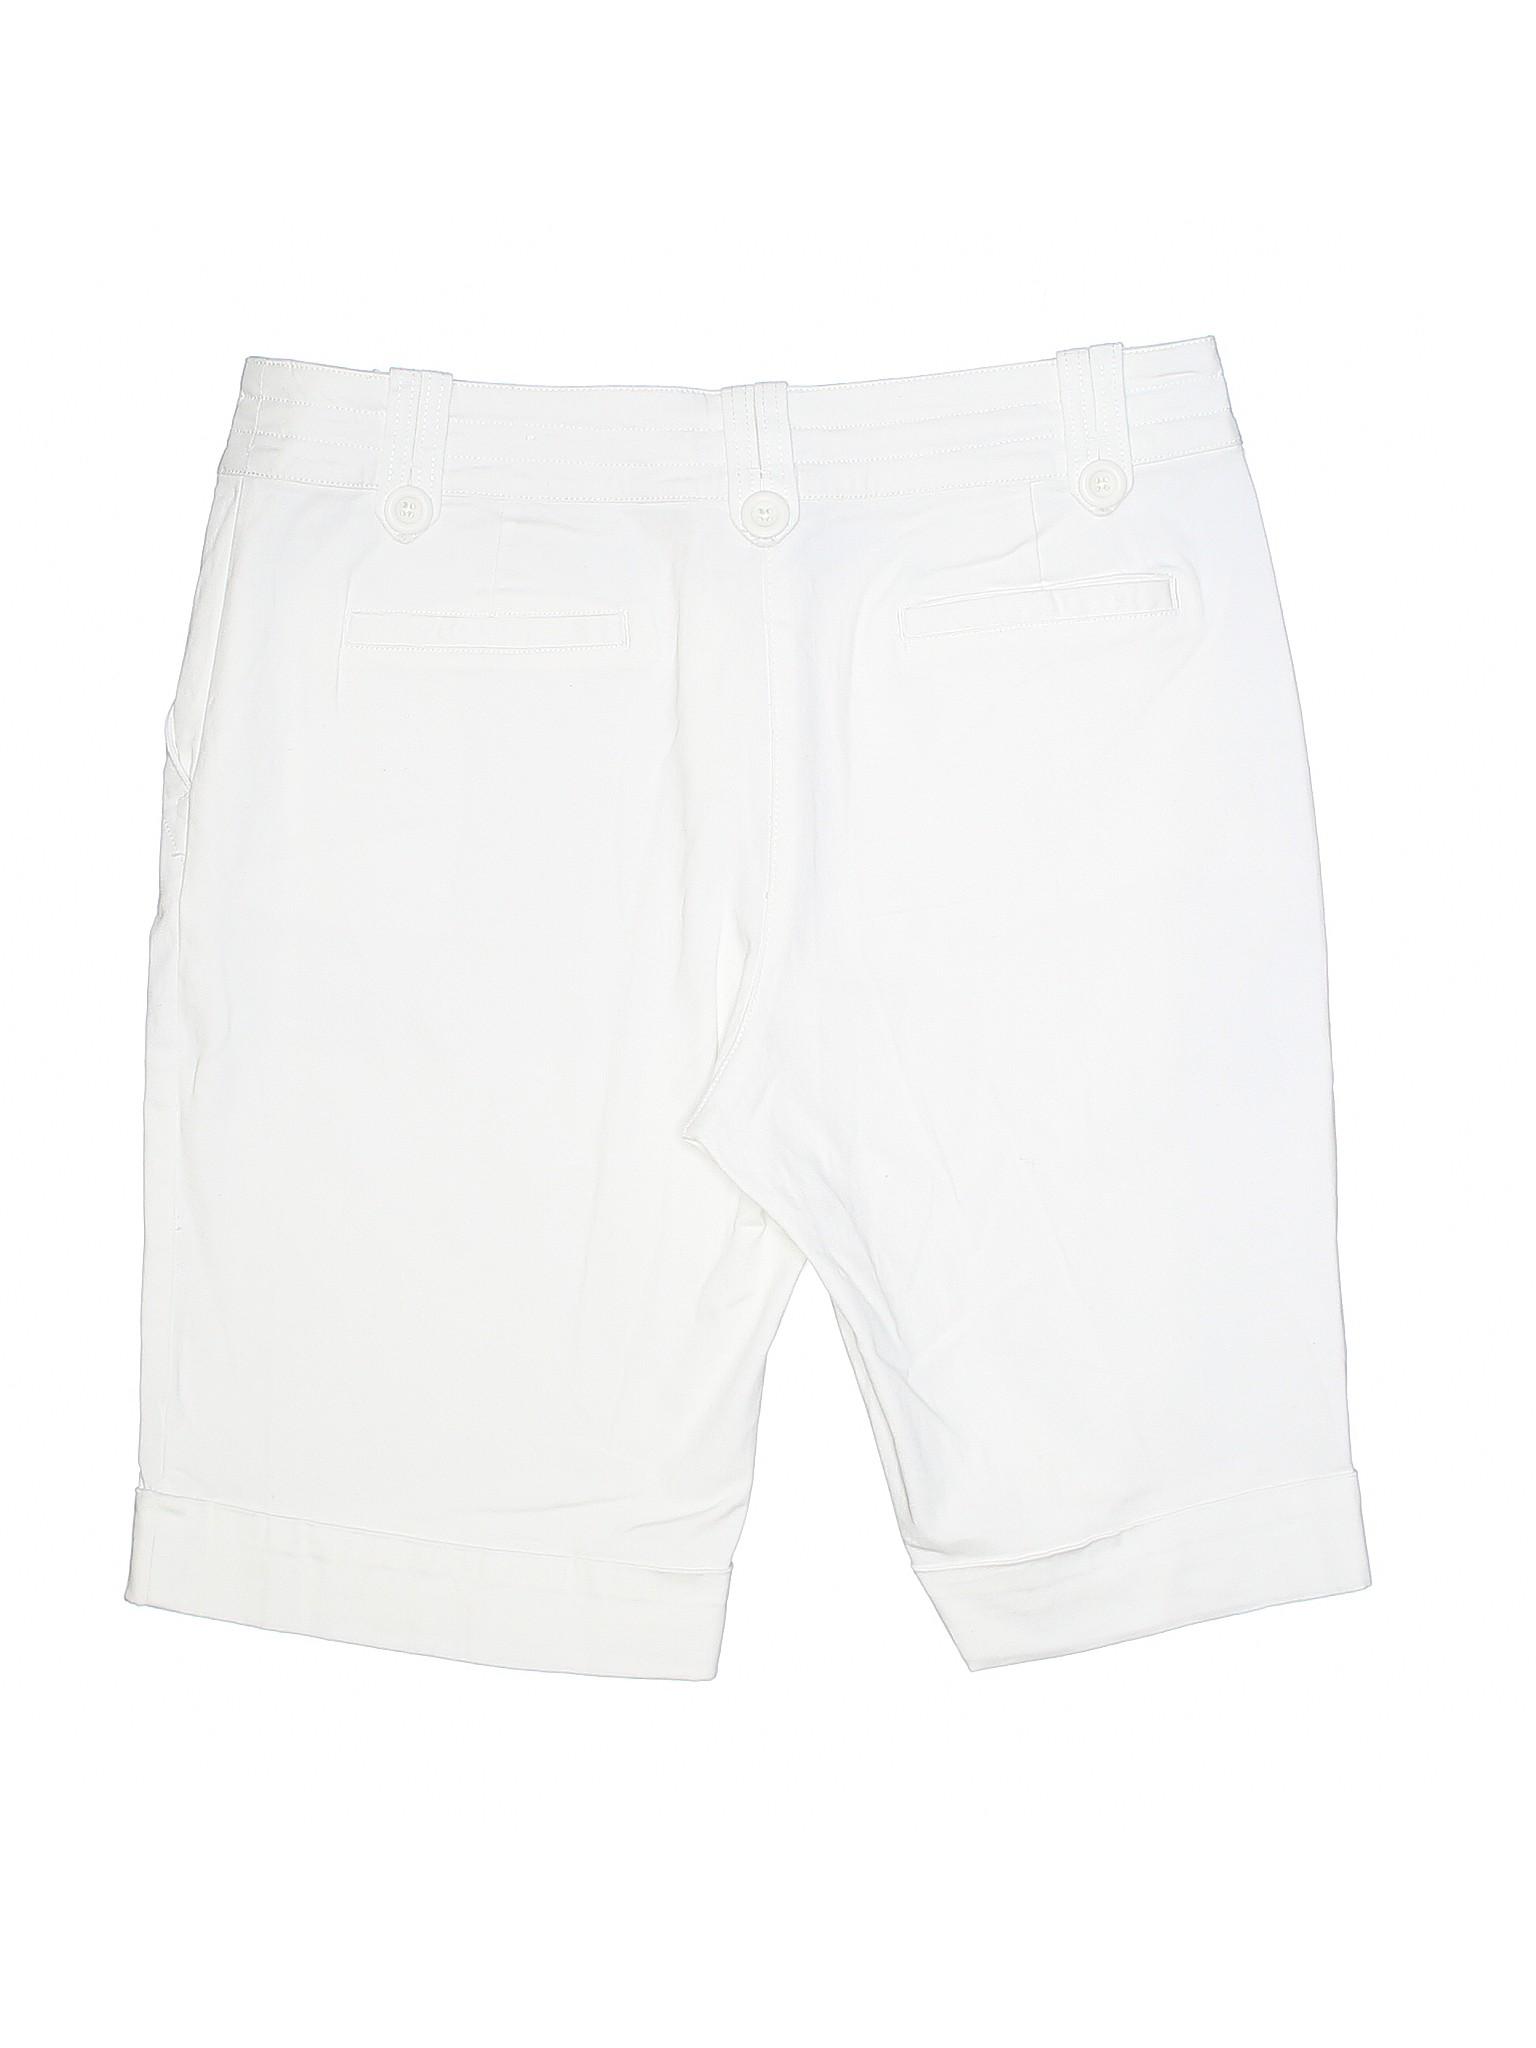 Boutique Shorts Khaki Shorts Boutique DressBarn Khaki Shorts Khaki Boutique DressBarn DressBarn EZd44wqxzA